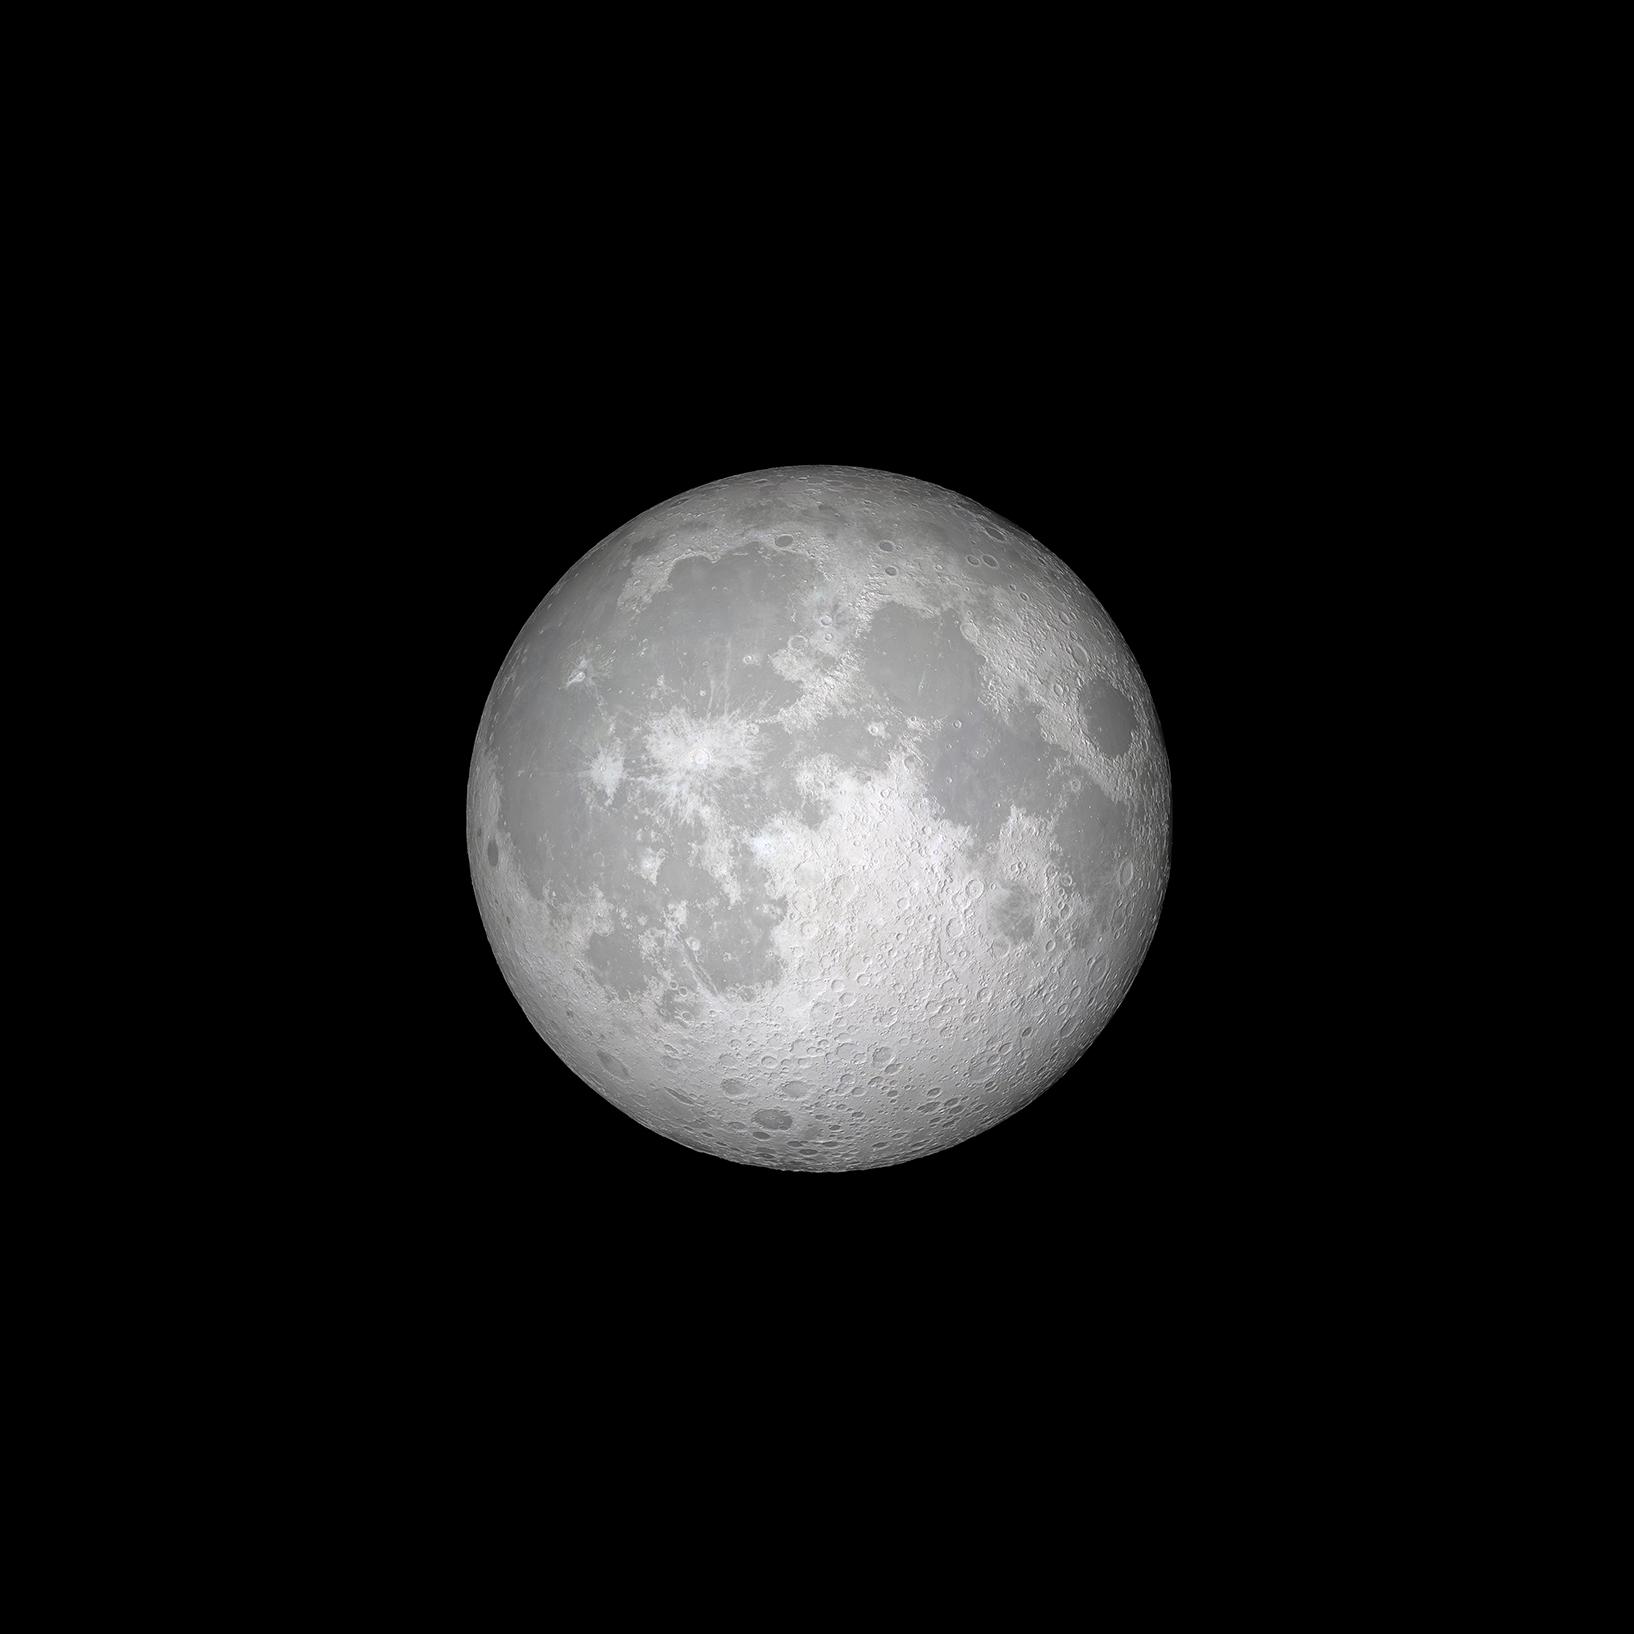 Ios 11 Gm Wallpaper Moon